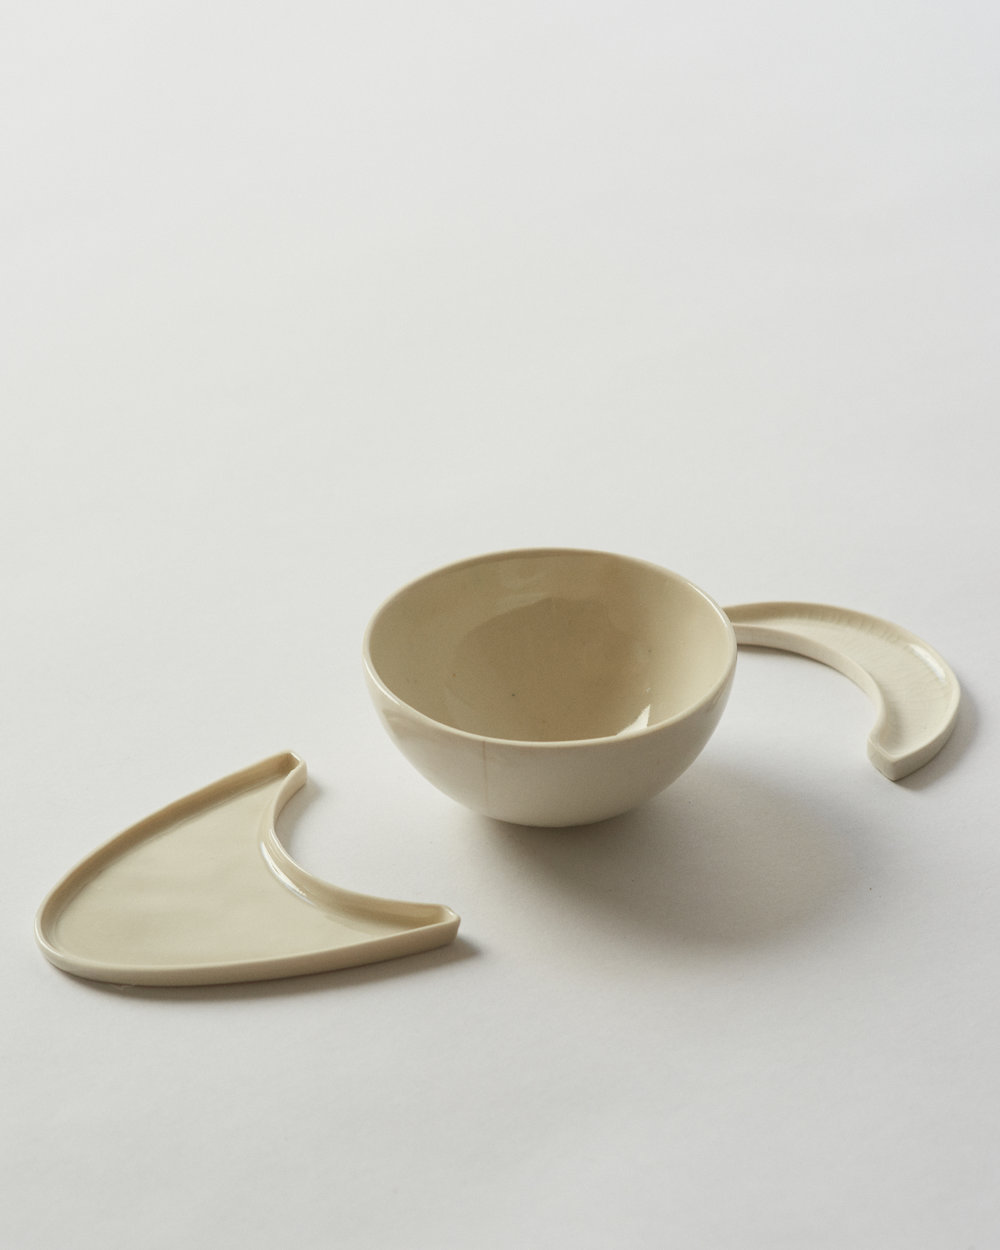 Handmade porcelain plates for an artful aperitivo display